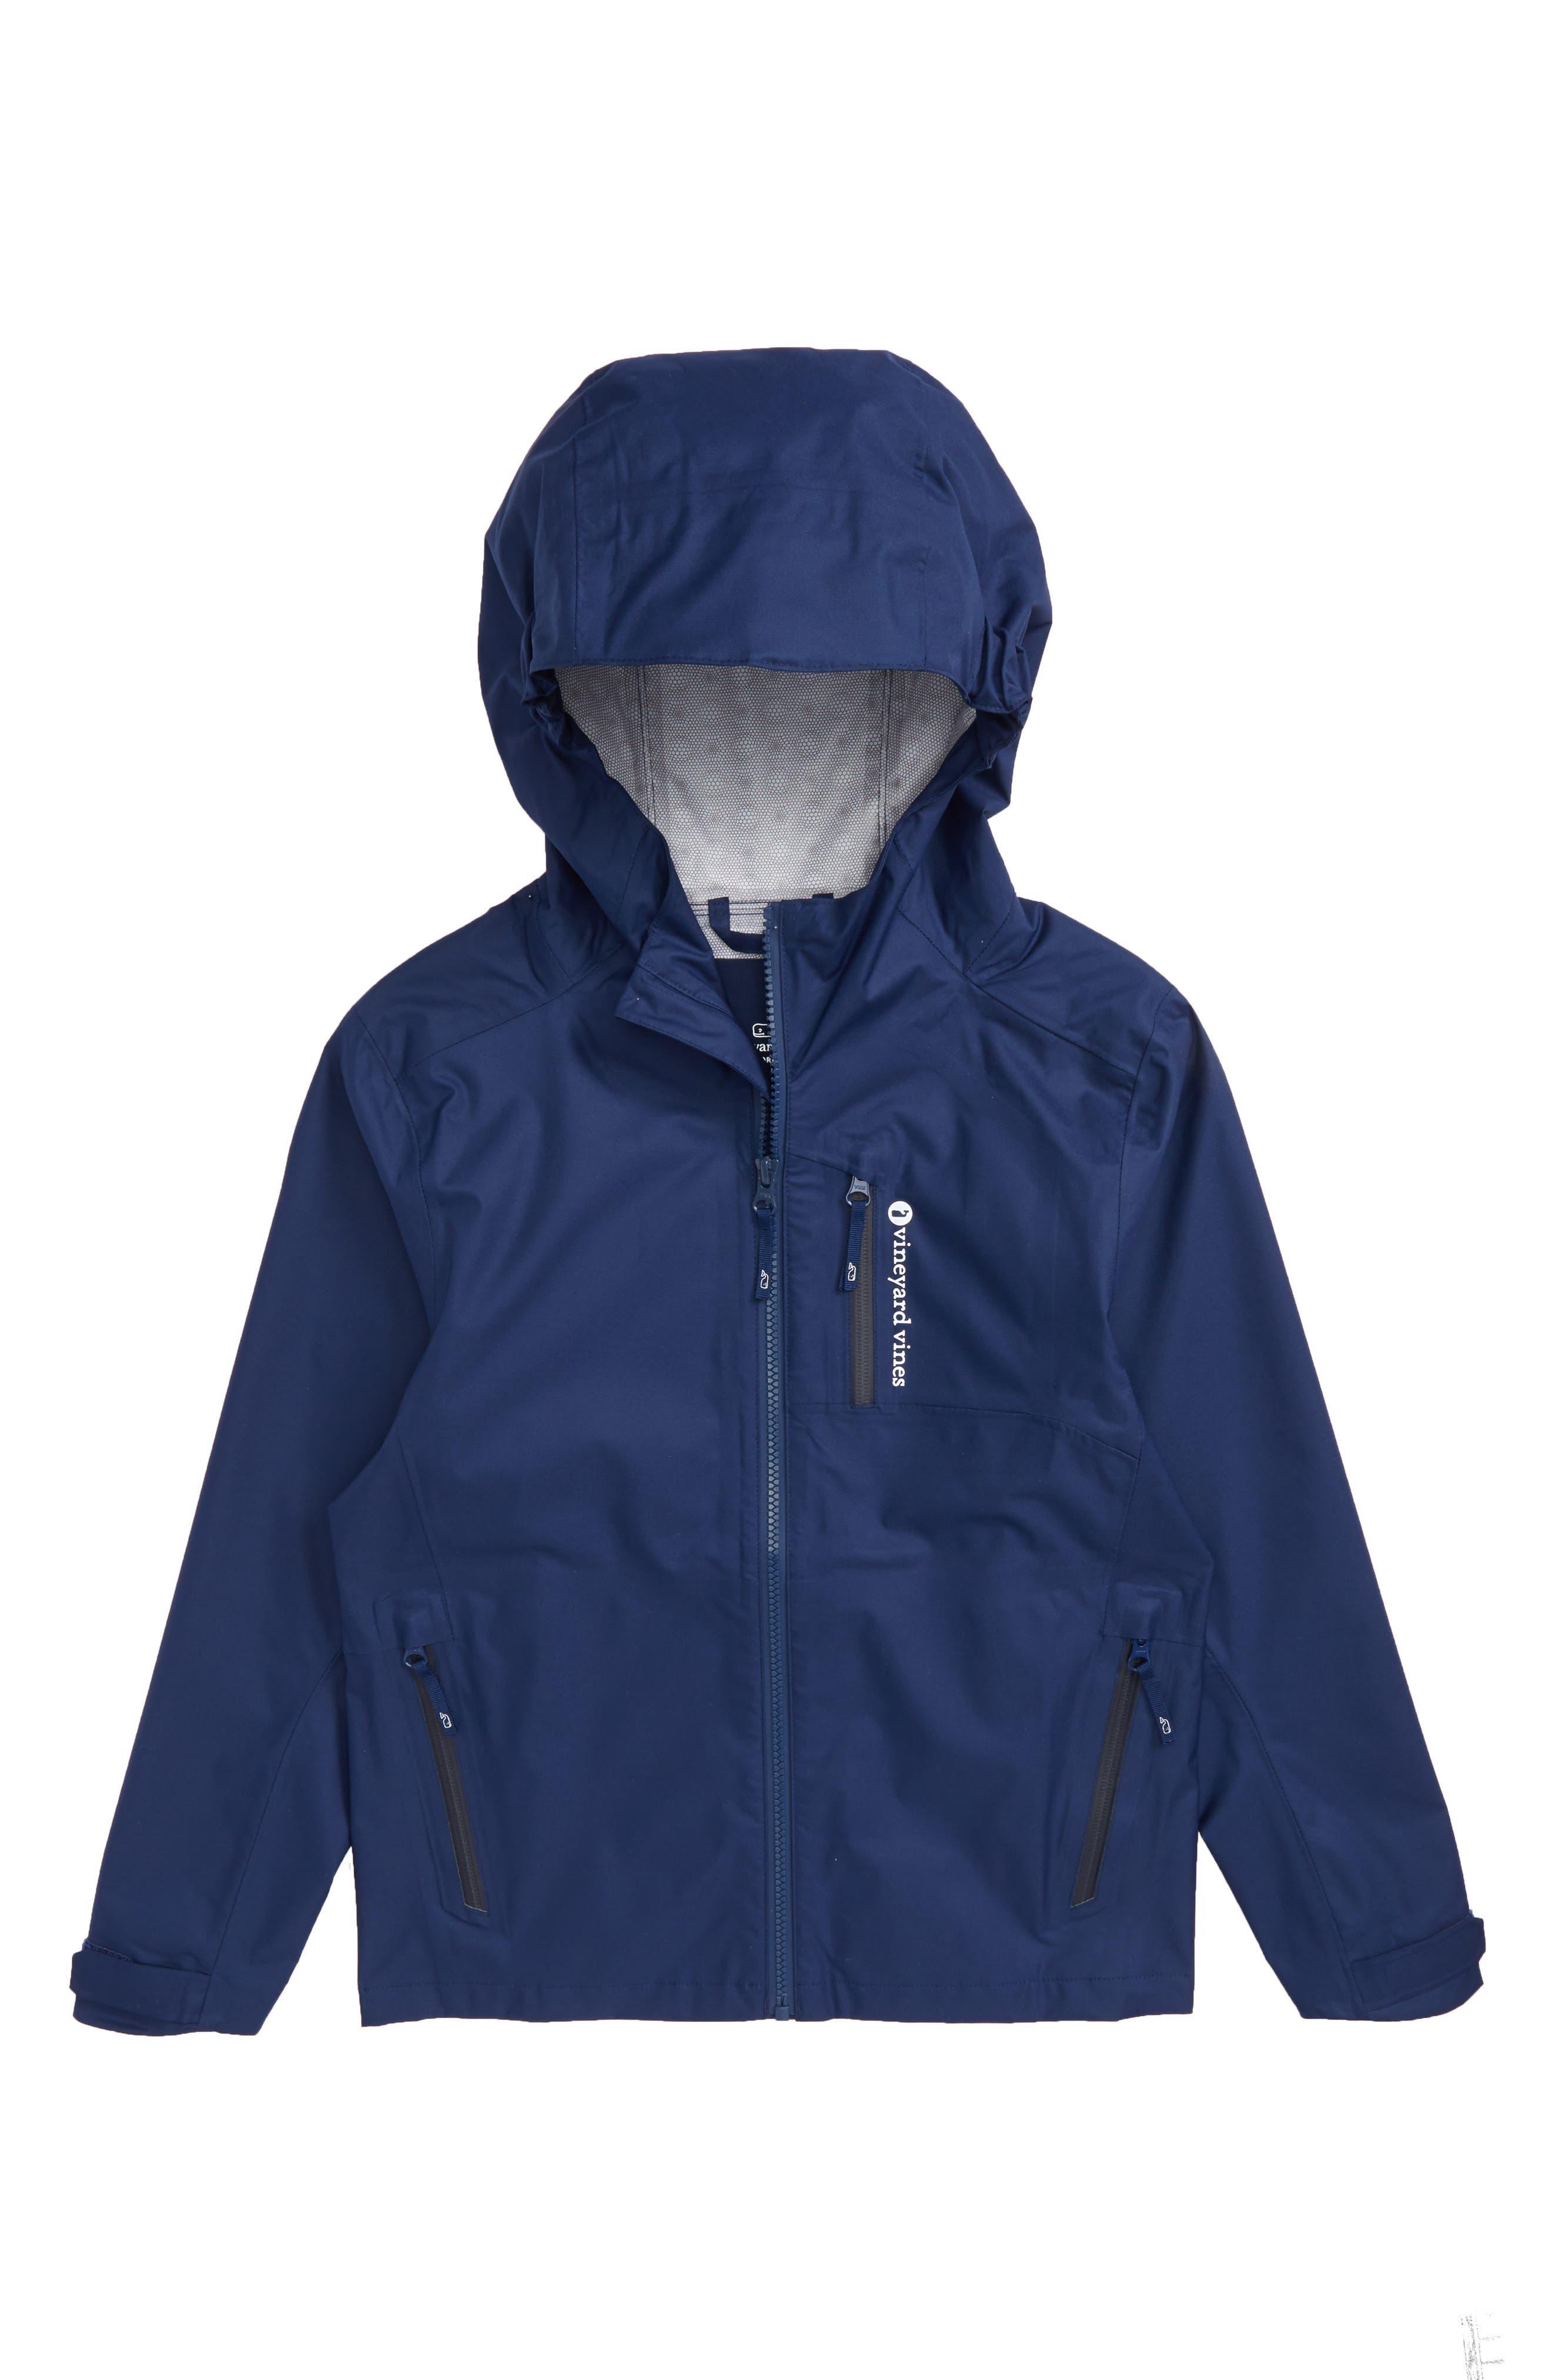 New Hooded Rain Jacket,                             Main thumbnail 1, color,                             405